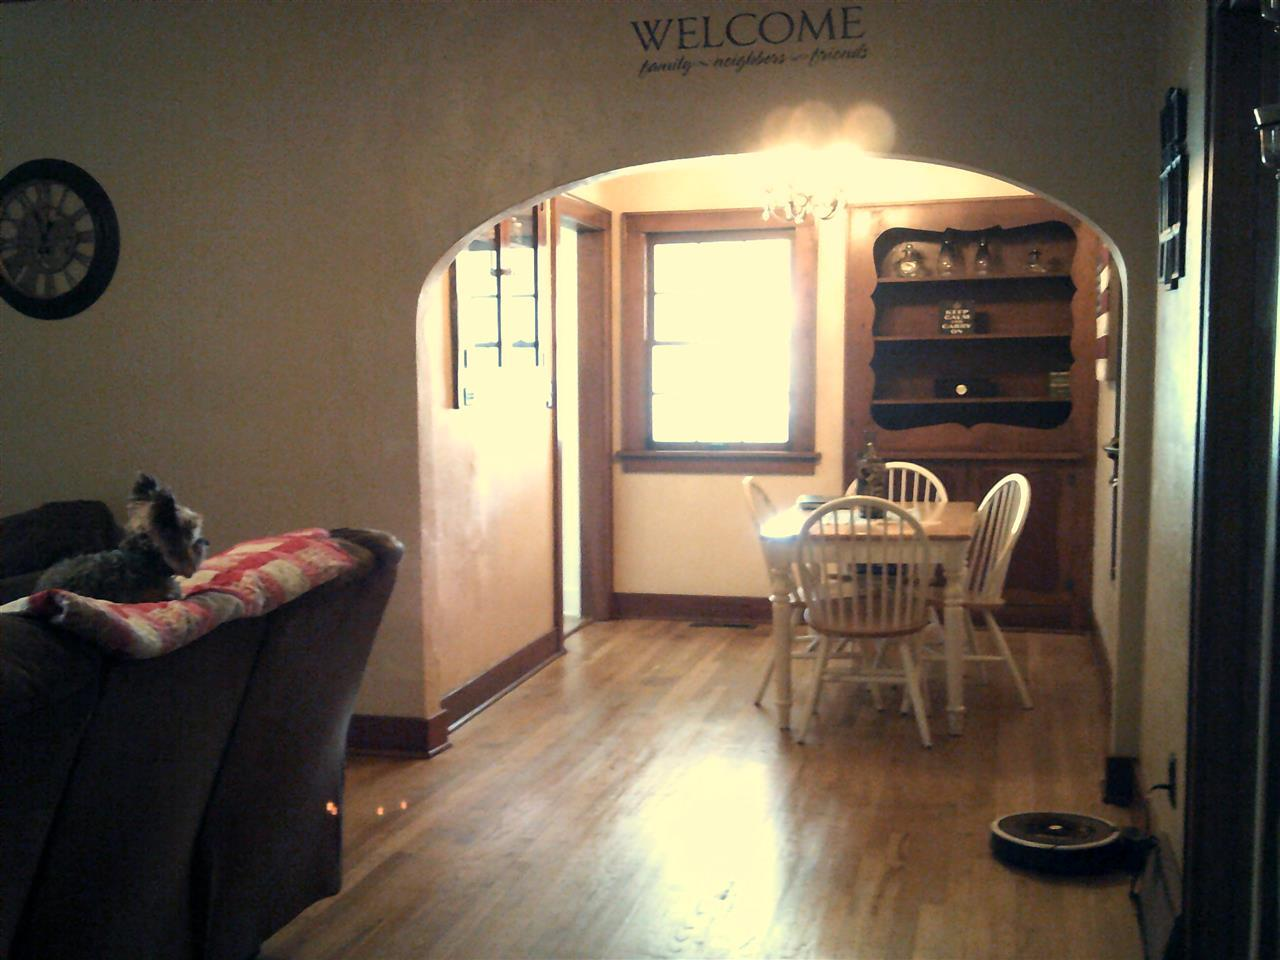 #century21groupone,#homesforsaleponcacity,#poncacityrealestate | 705 N 4th  Ponca City, OK 74601 5